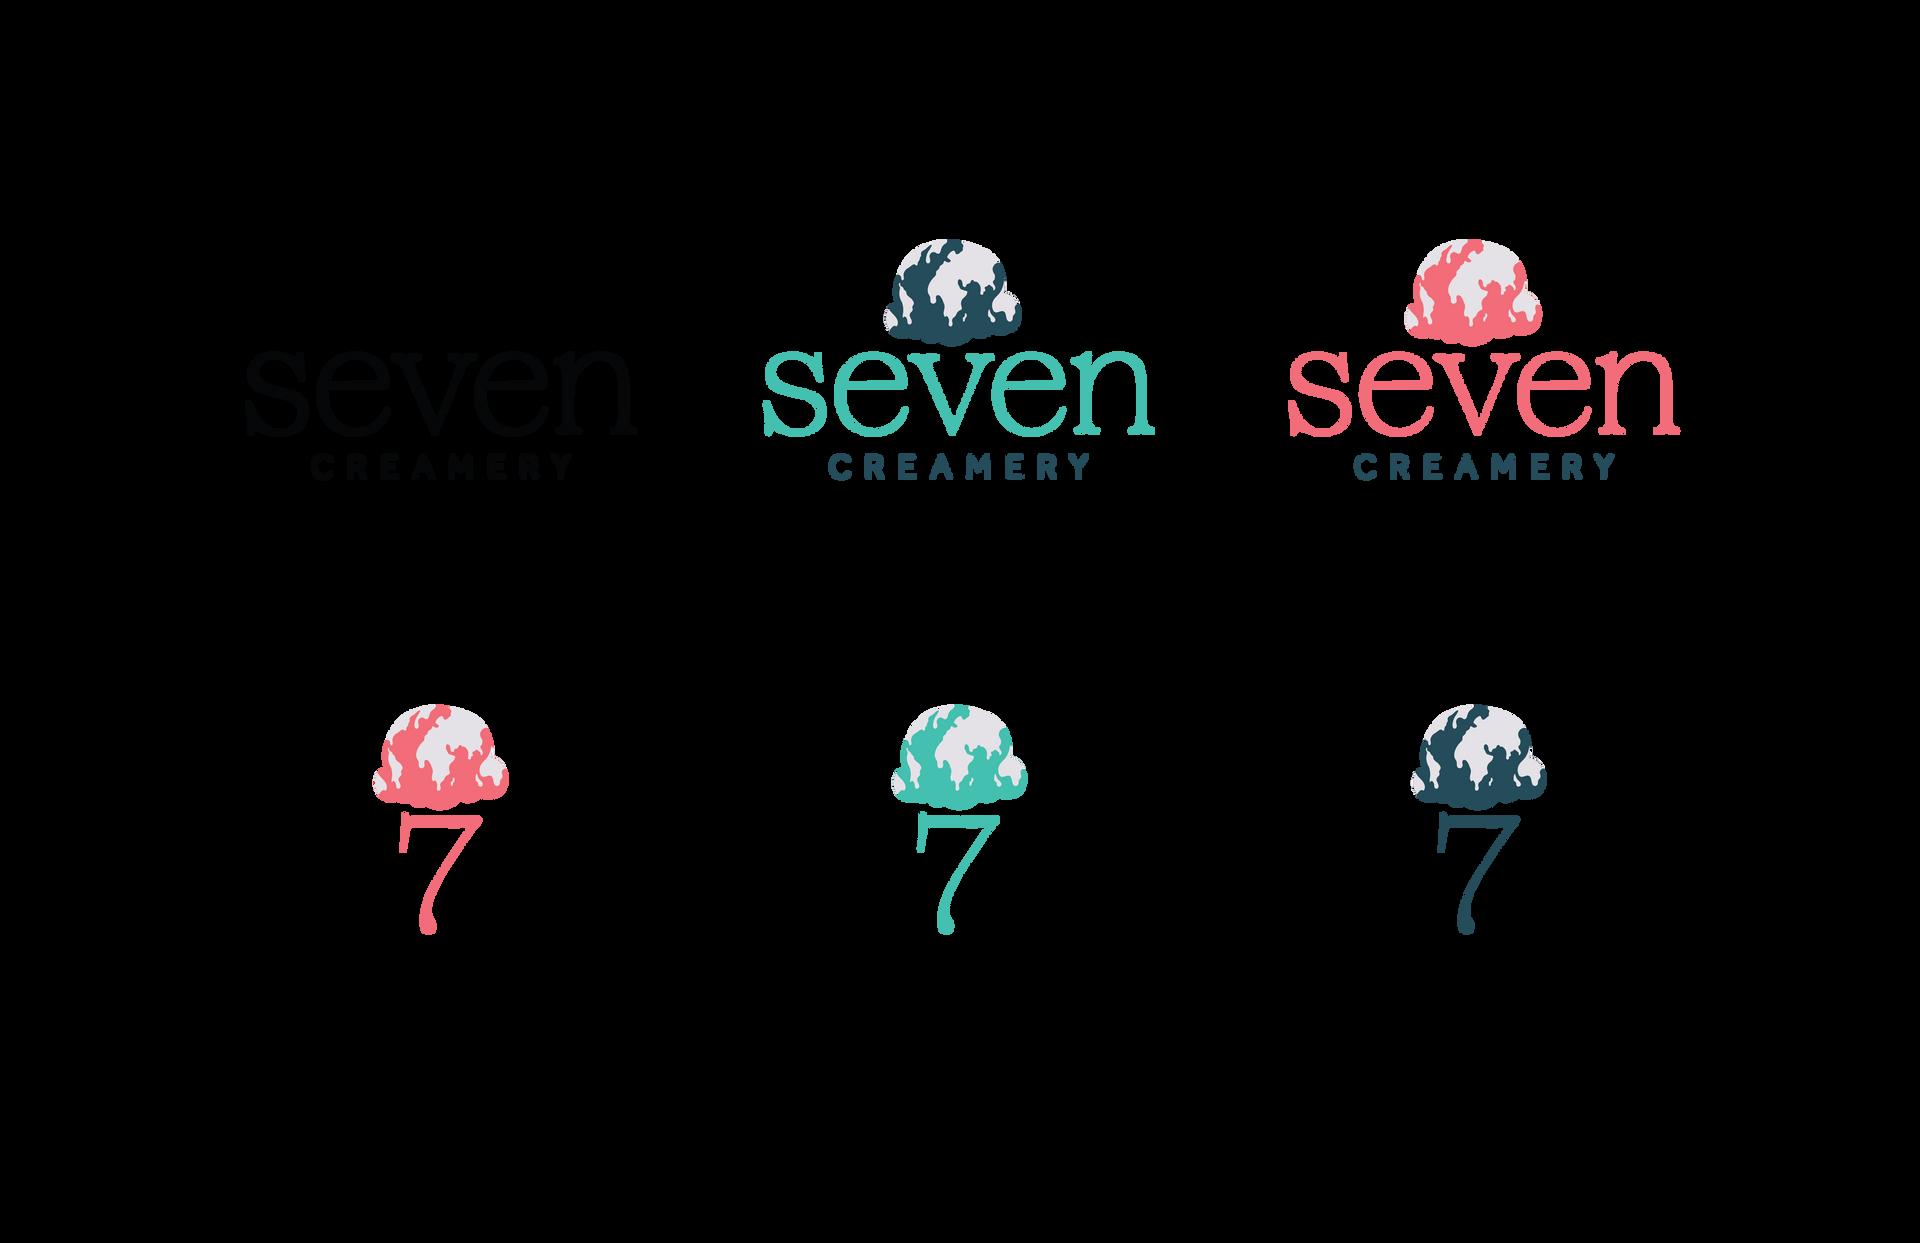 SevenCreamery_Logo_Variations-02.png